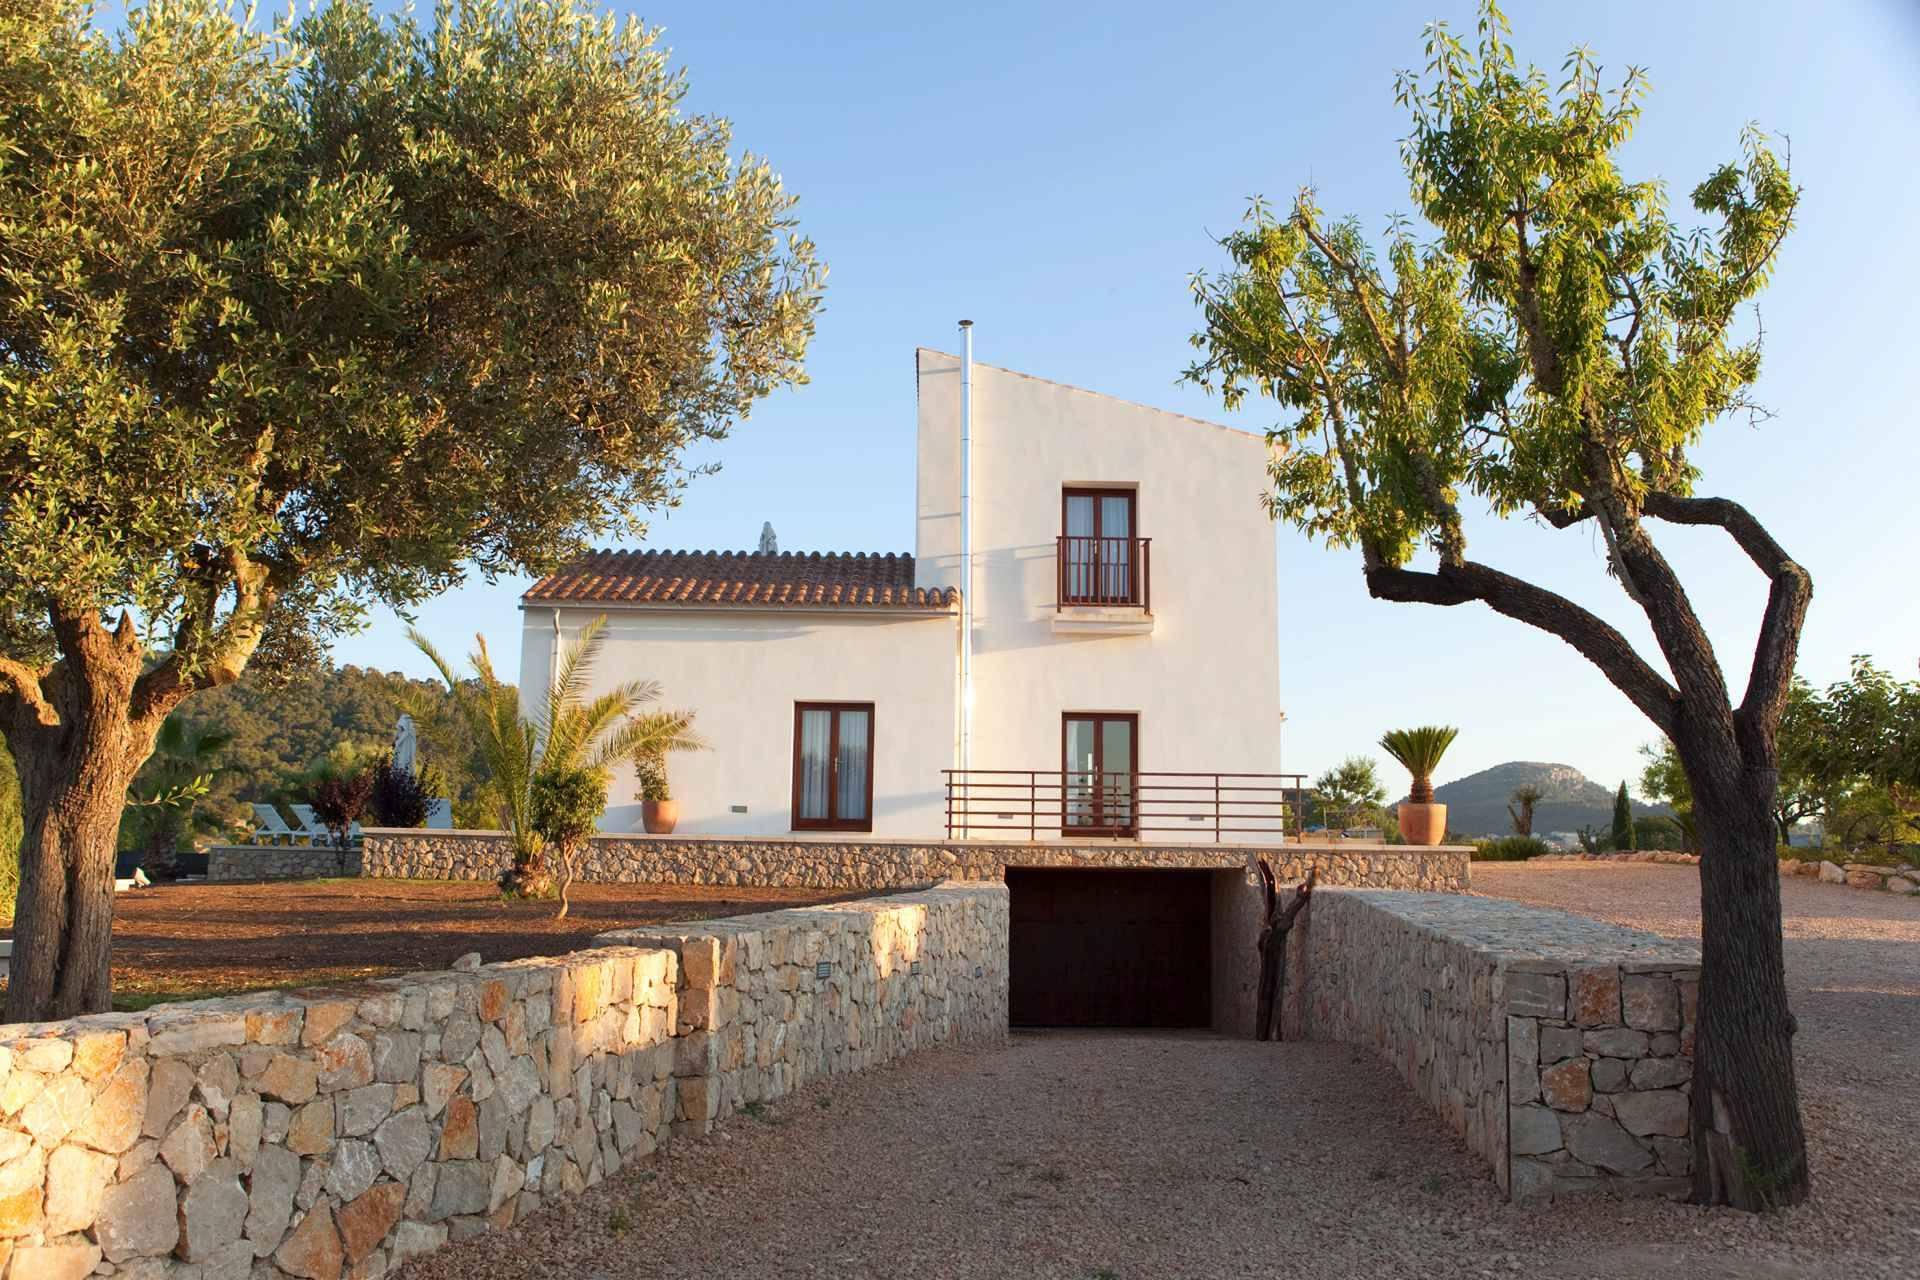 01-28 Luxus Finca Mallorca Nordosten Bild 42